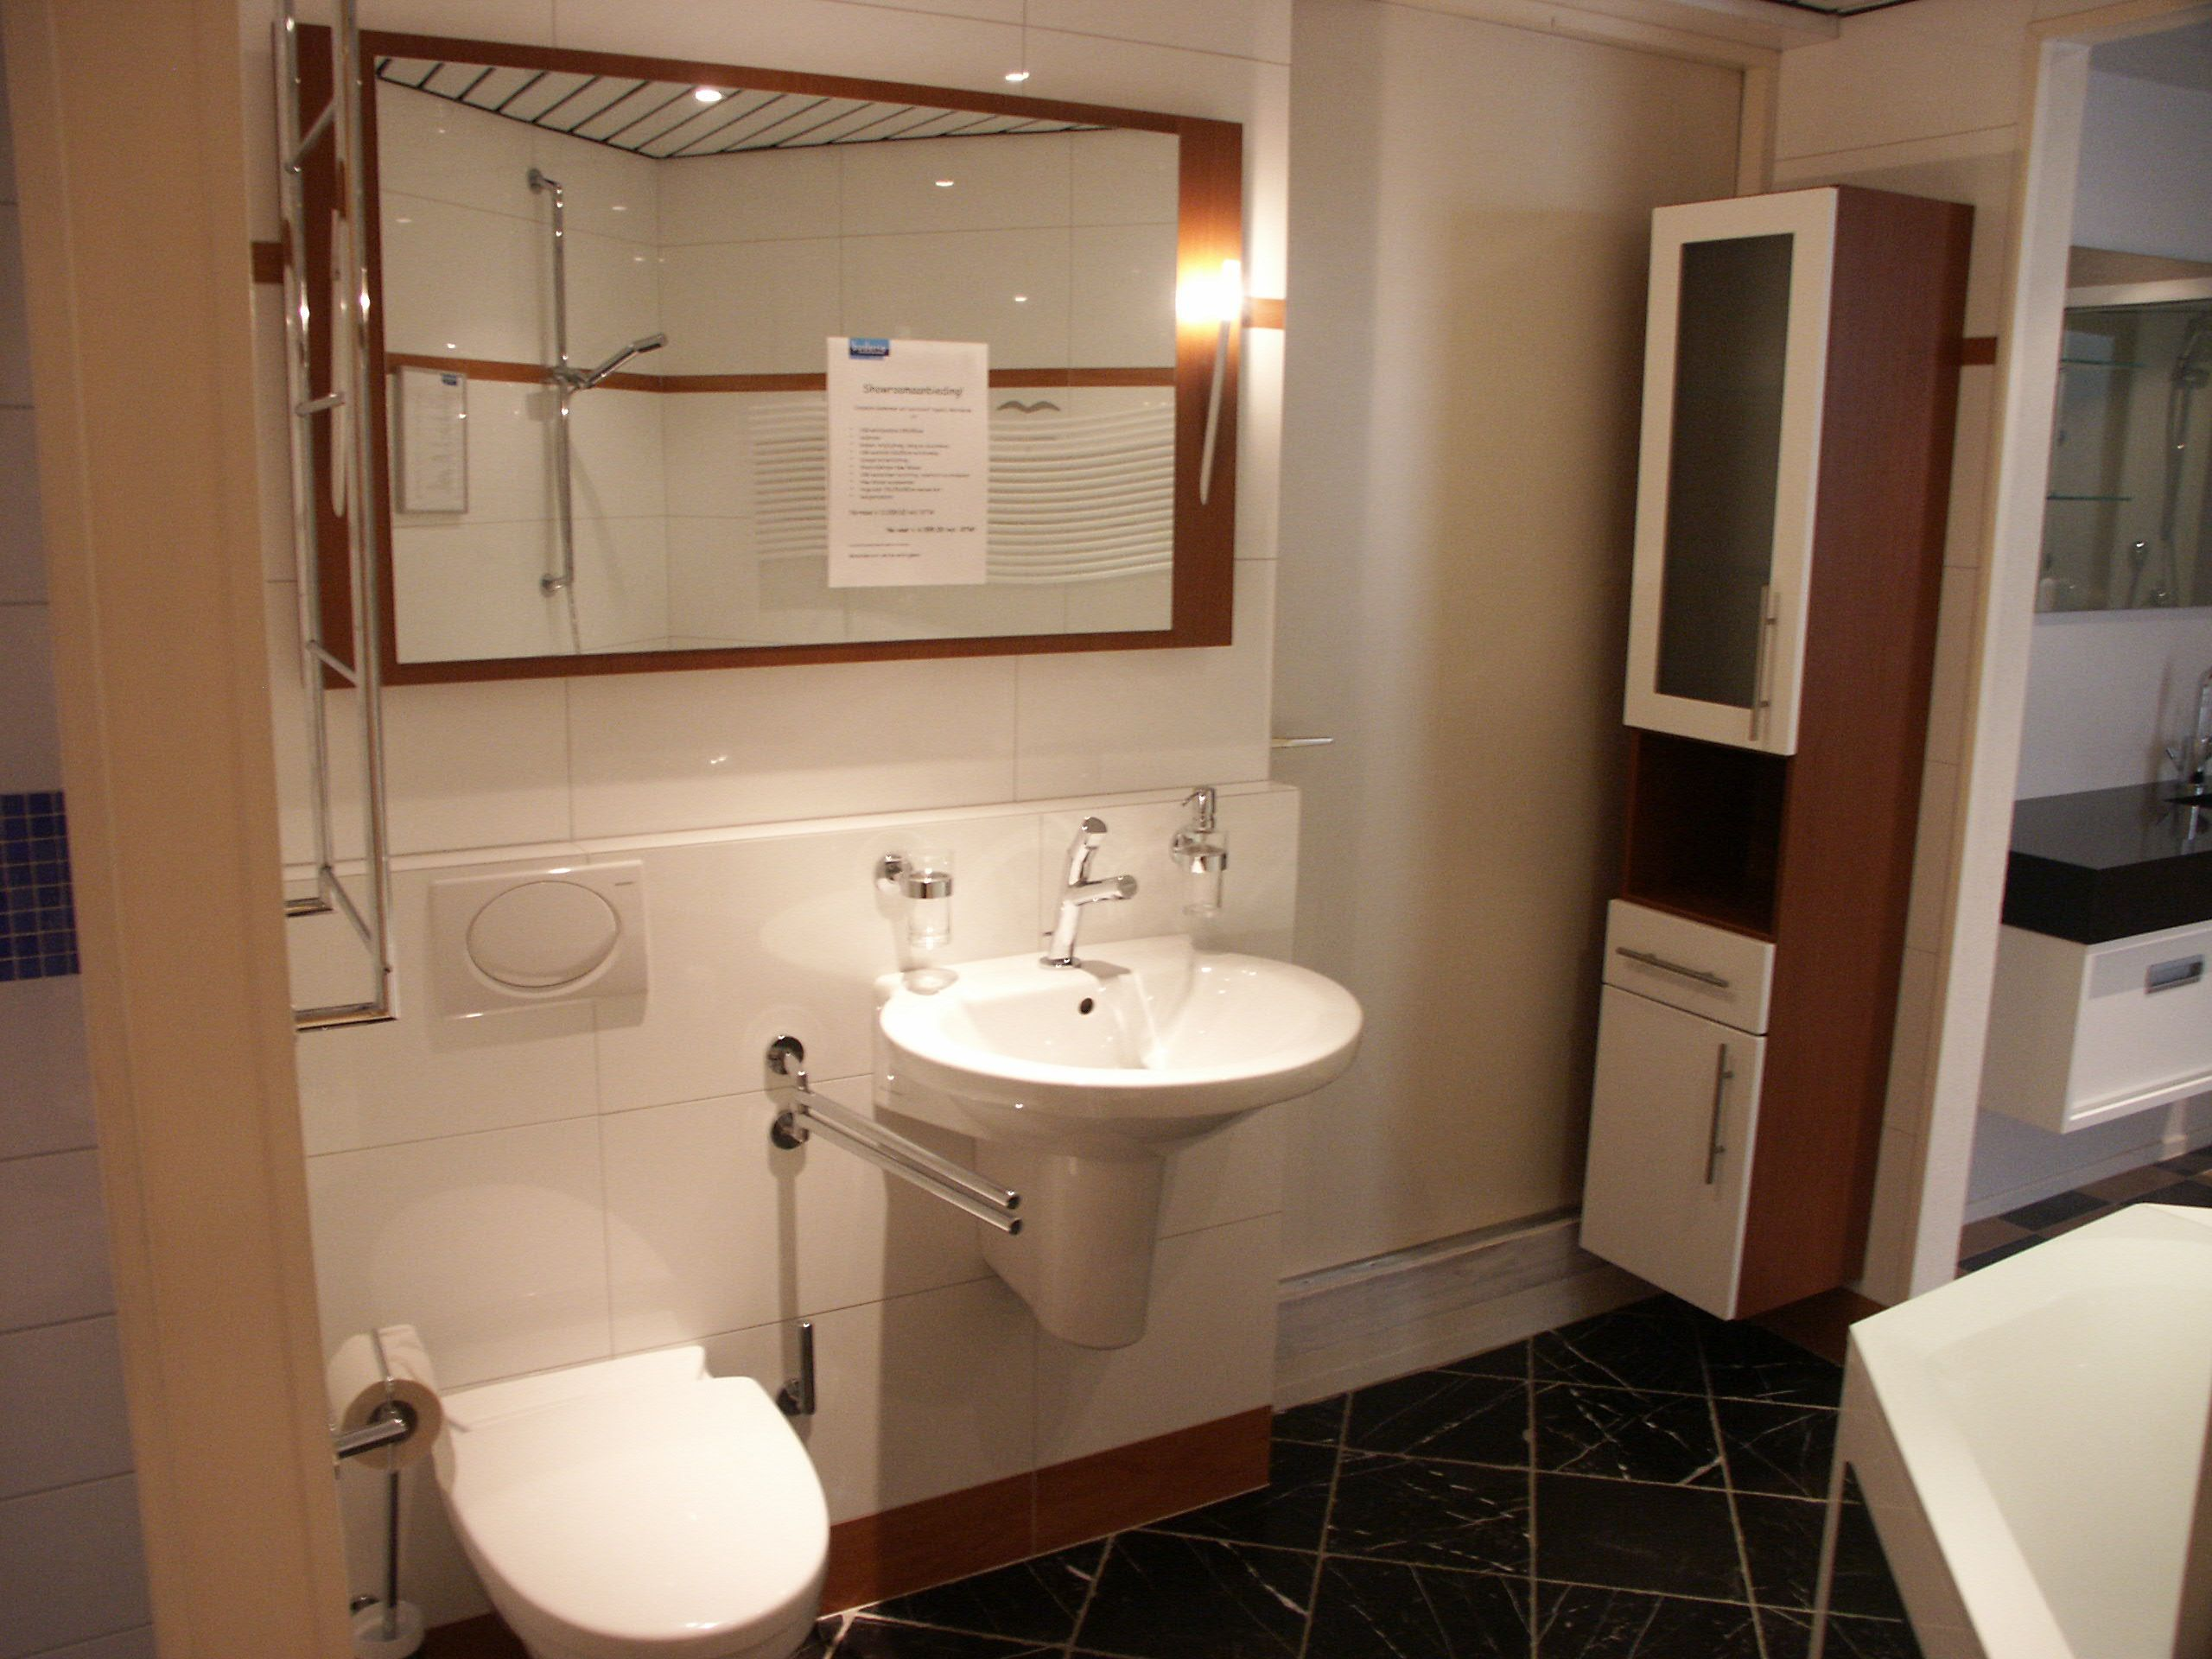 Villeroy Boch Badezimmer Accessoires ~ Wohndesign & Möbel Ideen